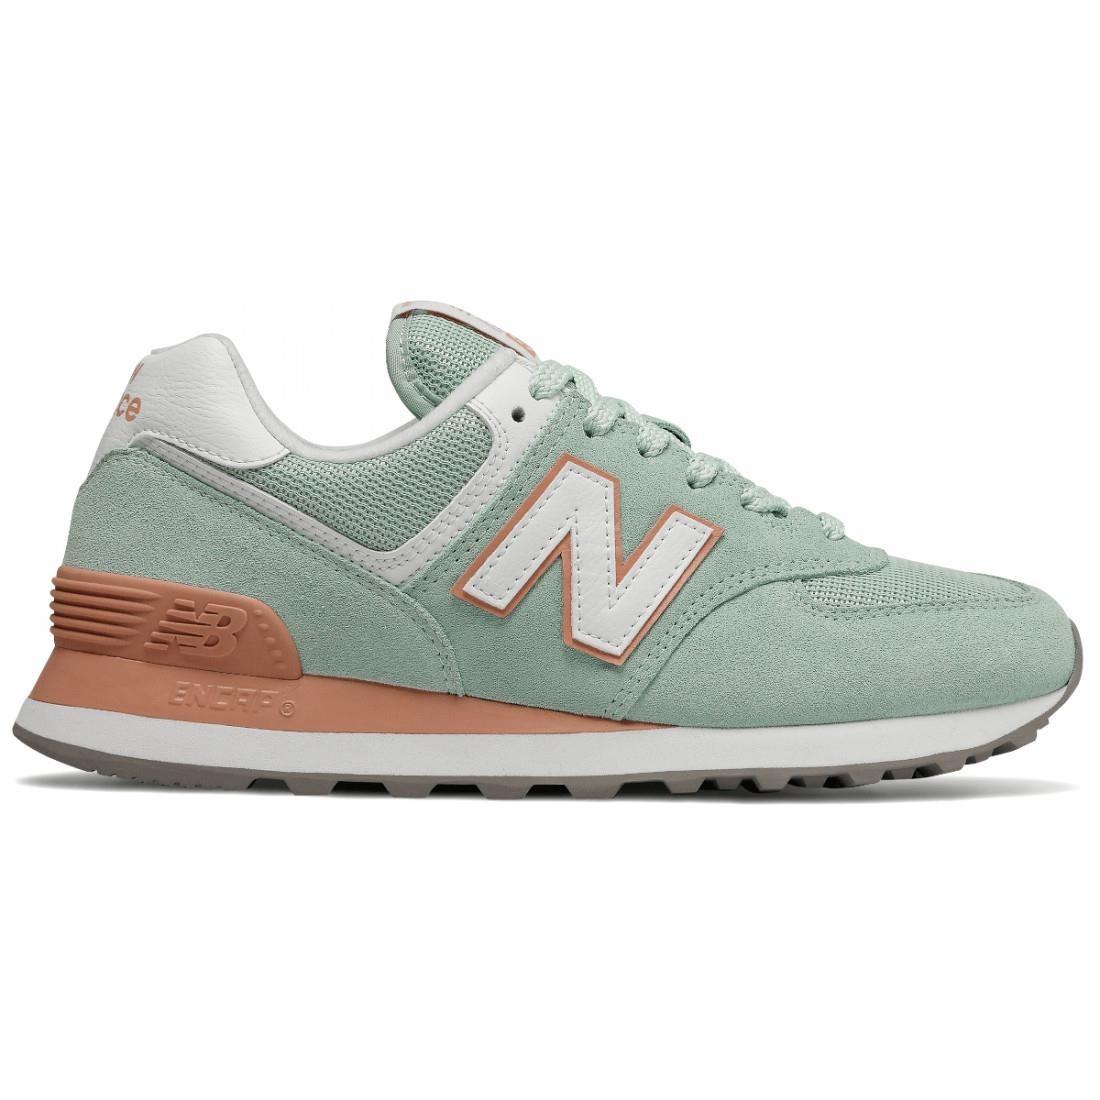 Buty New Balance NBWL574ESE NBWL574ESE-a2 r 40,5